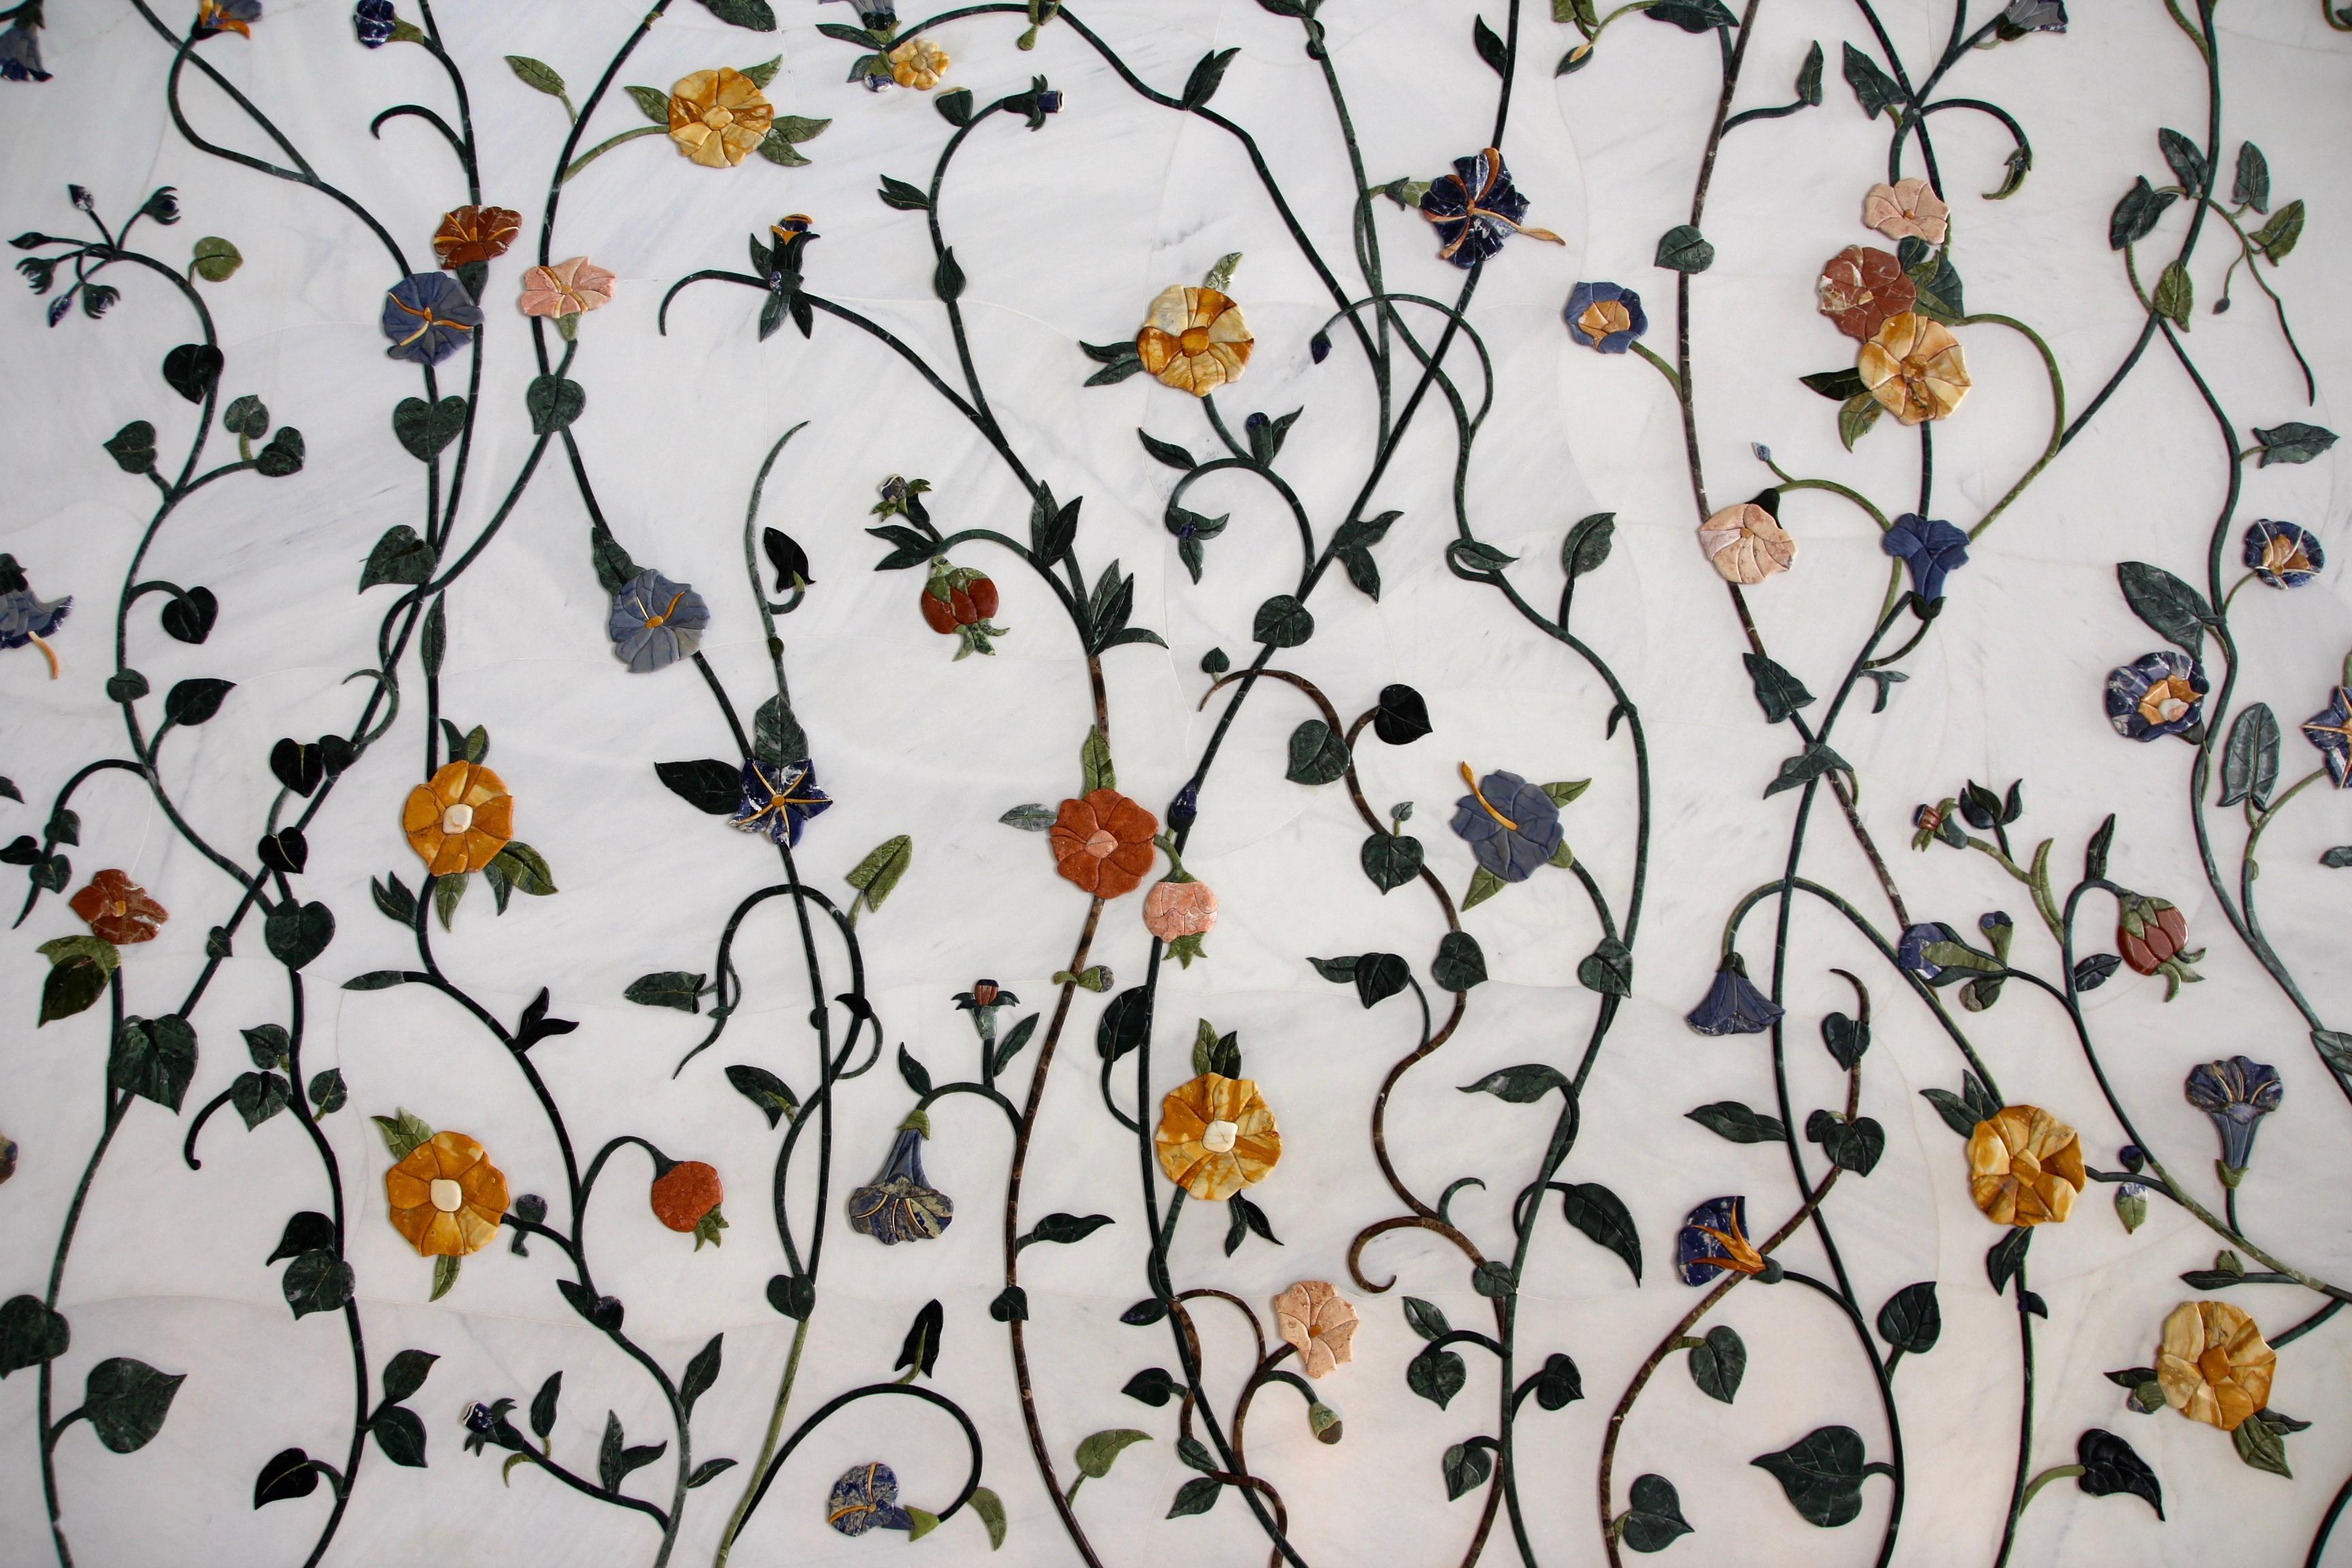 Branch Vine Leaf Flower Pattern Botany Decor Flora Textile Art Decorative Flooring